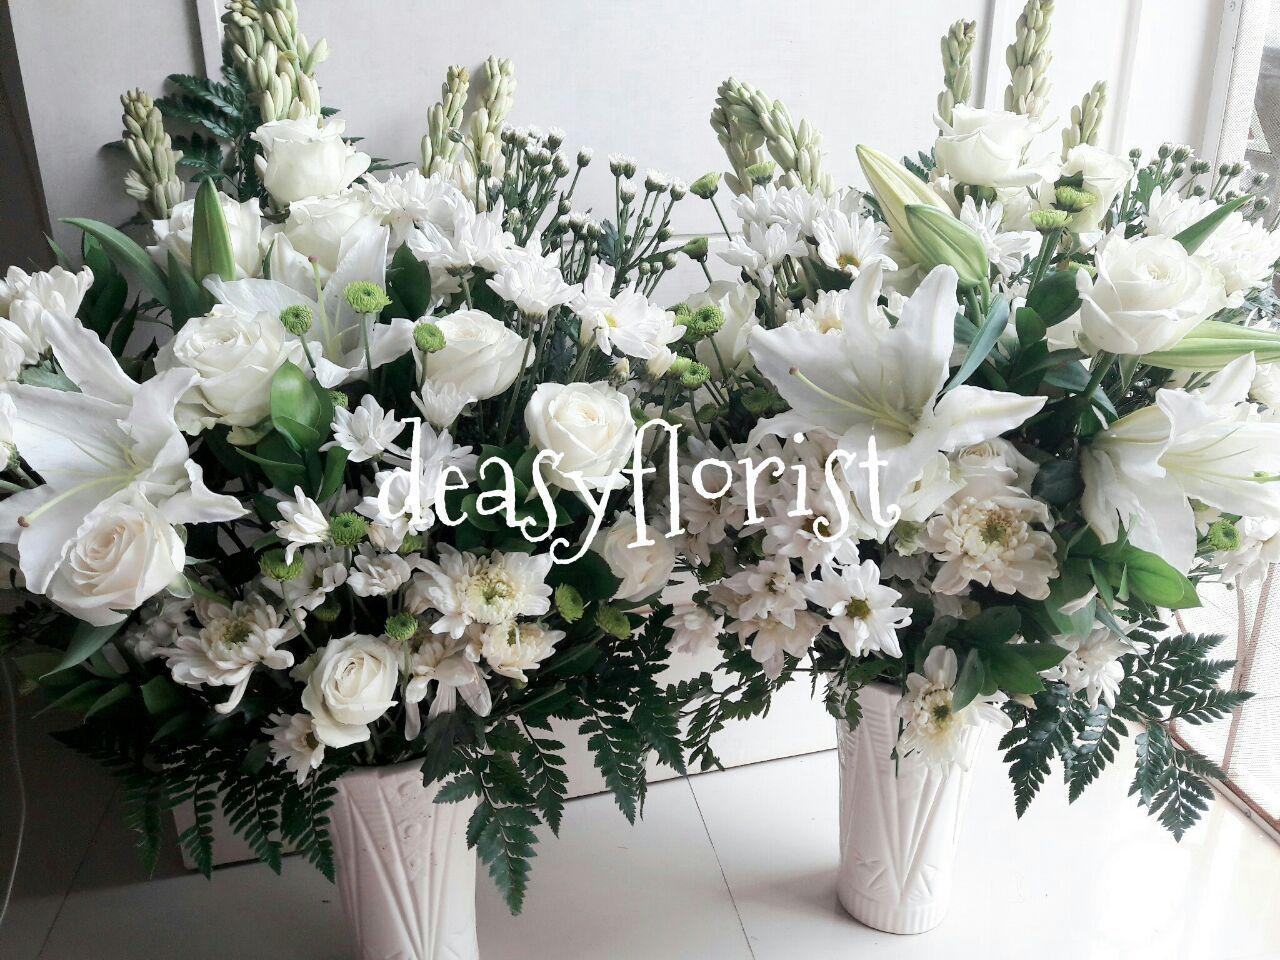 Deasy Florist Florist Serpong Florist Gading Serpong Florist Bsd Florist Alam Sutera Florist Tangerang Florist Karawaci Fl Bunga Buket Pernikahan Penjual Bunga